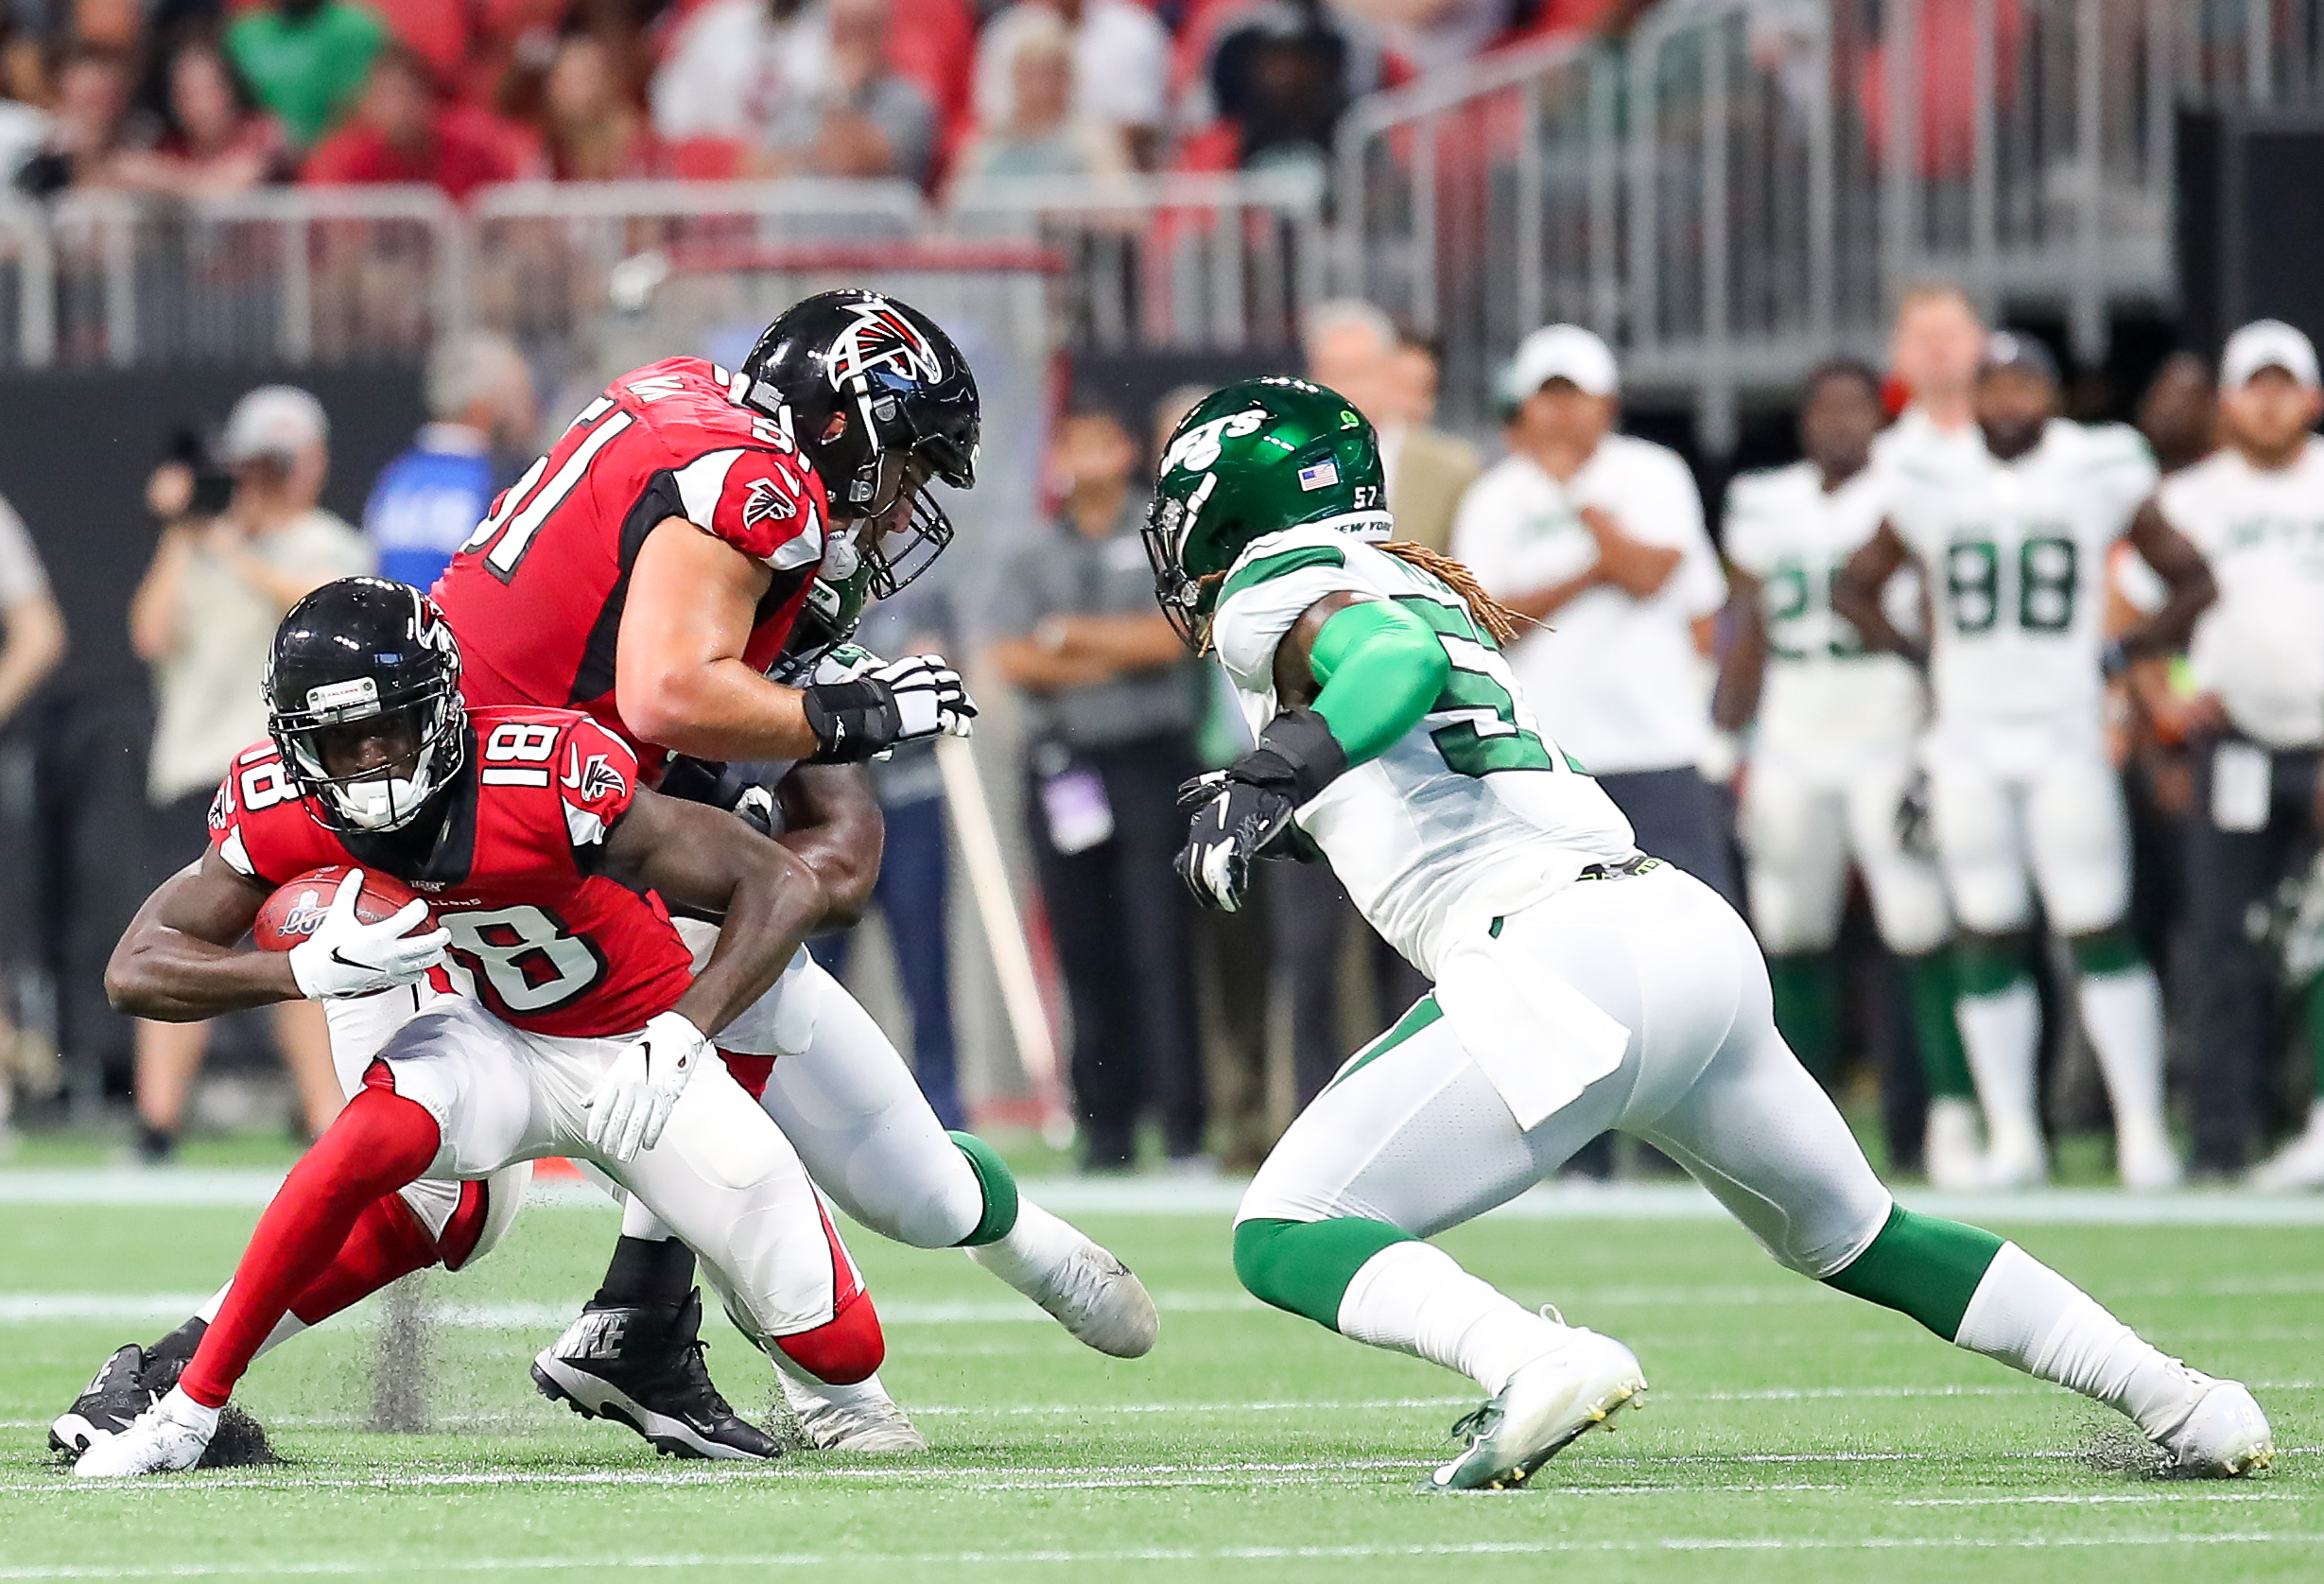 NFL: AUG 15 Preseason - Jets at Falcons